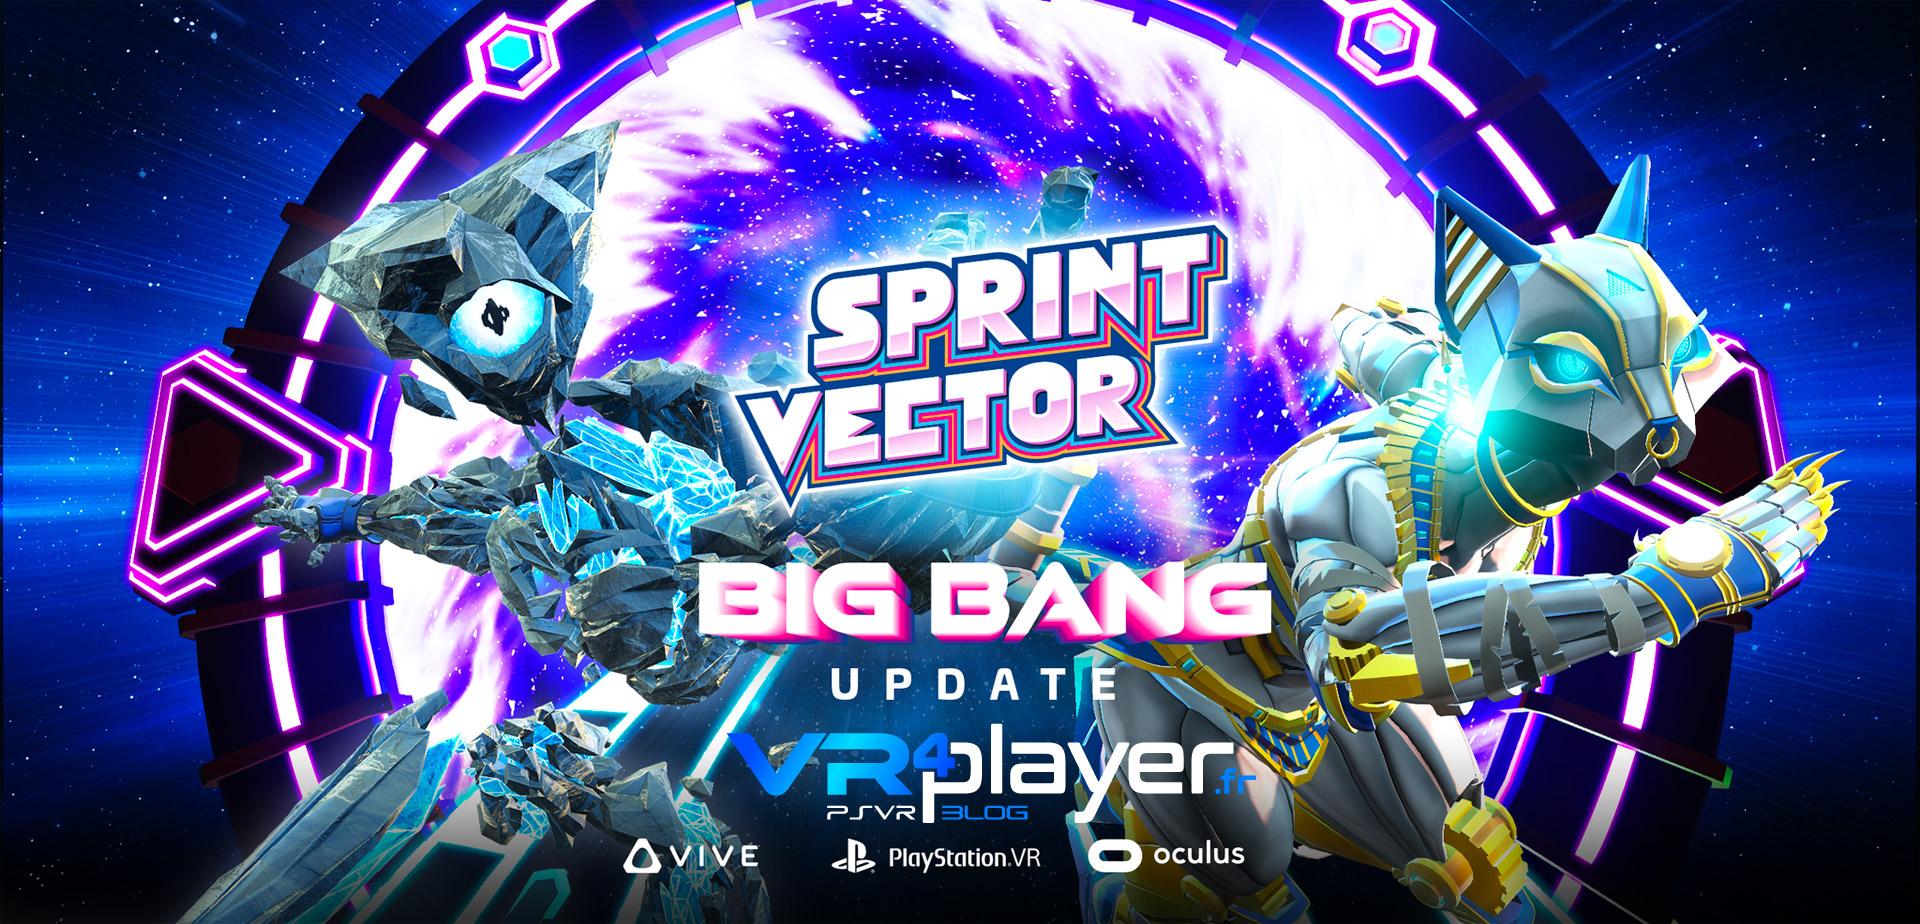 Sprint Vector Bing Bang update